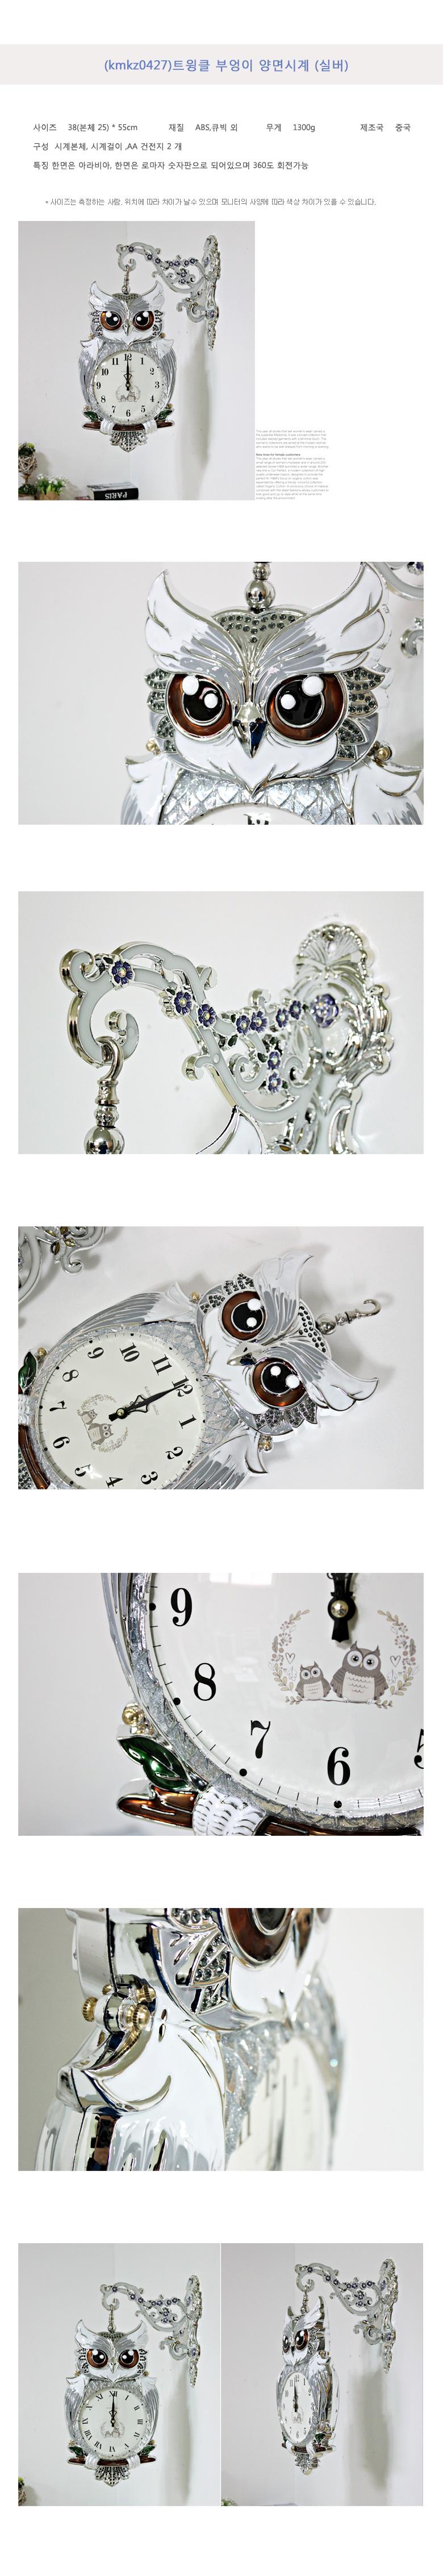 (kmkz0427)트윙클 부엉이 양면시계 (실버) - 키다리, 89,000원, 양면시계, 앤틱